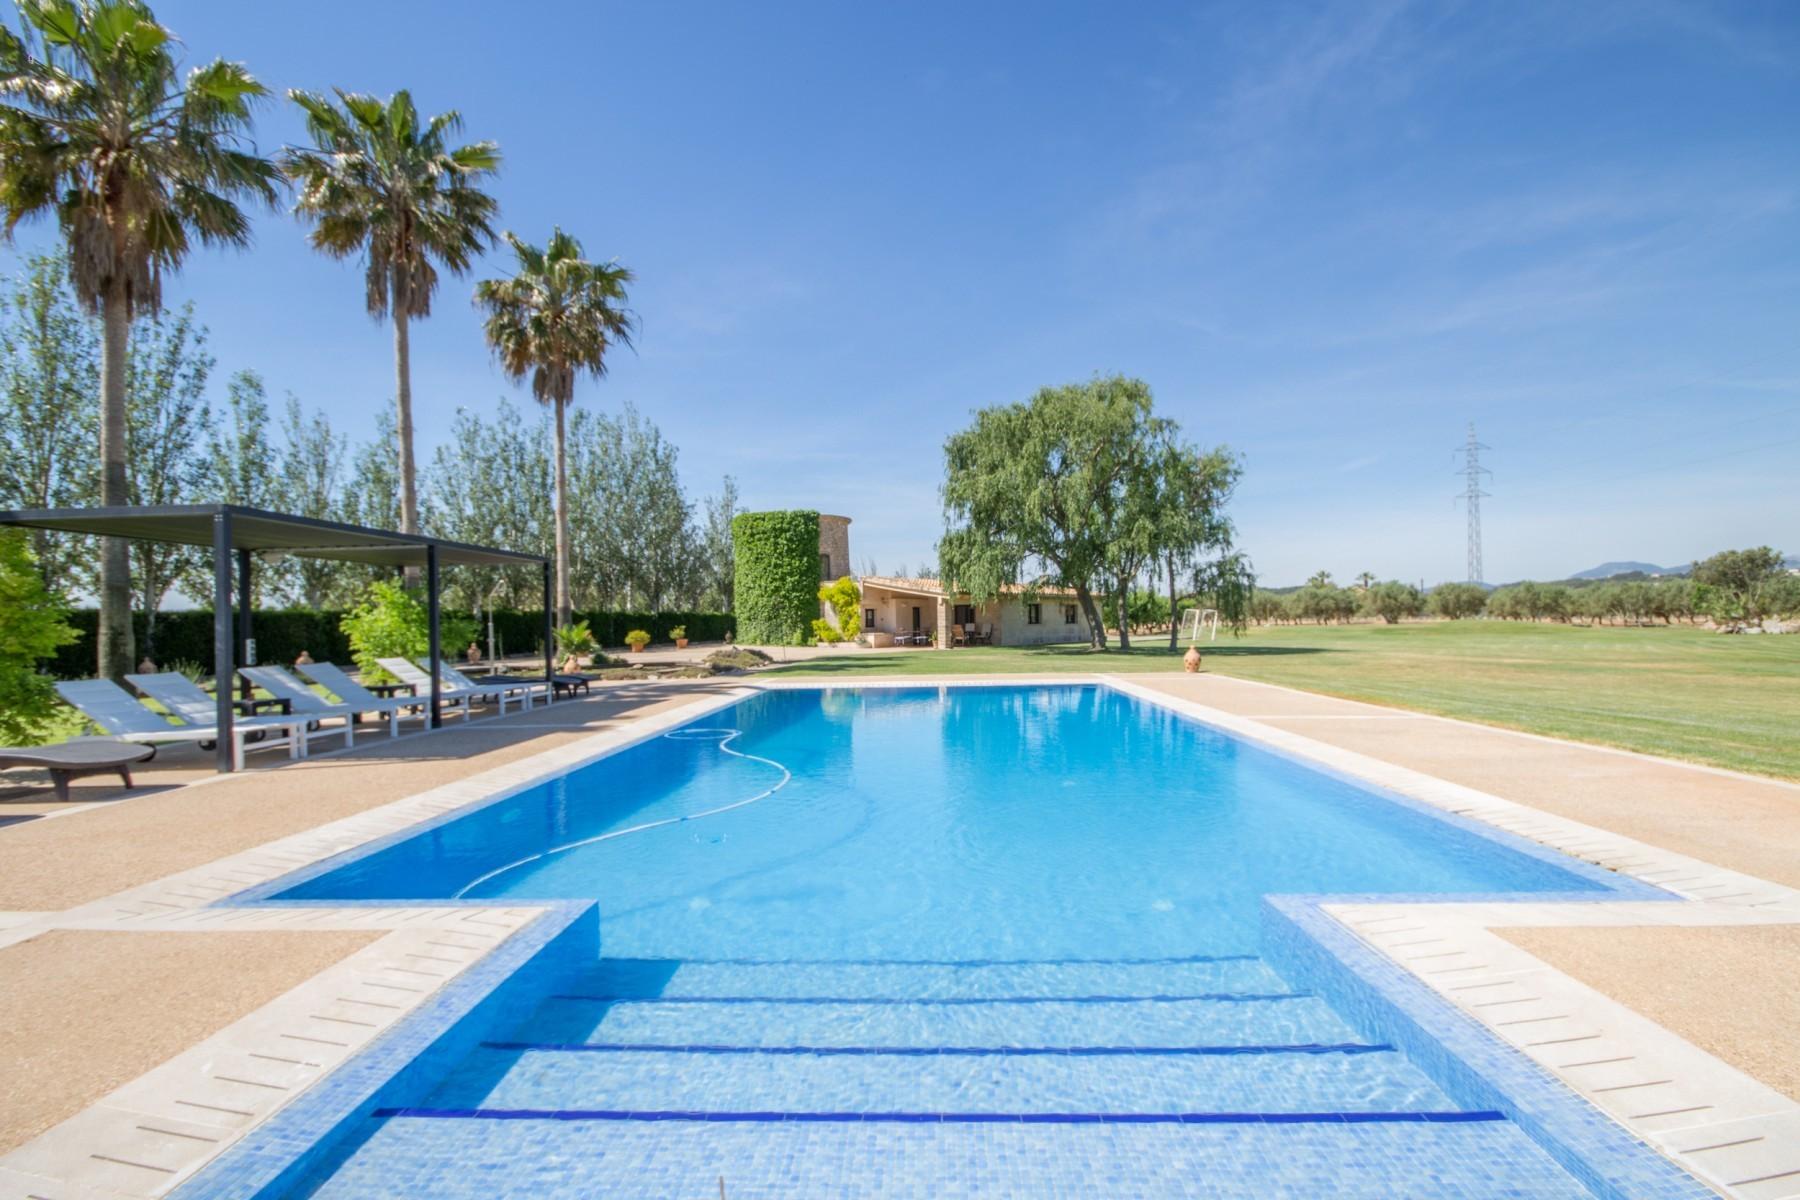 Casa rural con piscina para 15 personas en b ger mallorca for Casa rural 15 personas con piscina